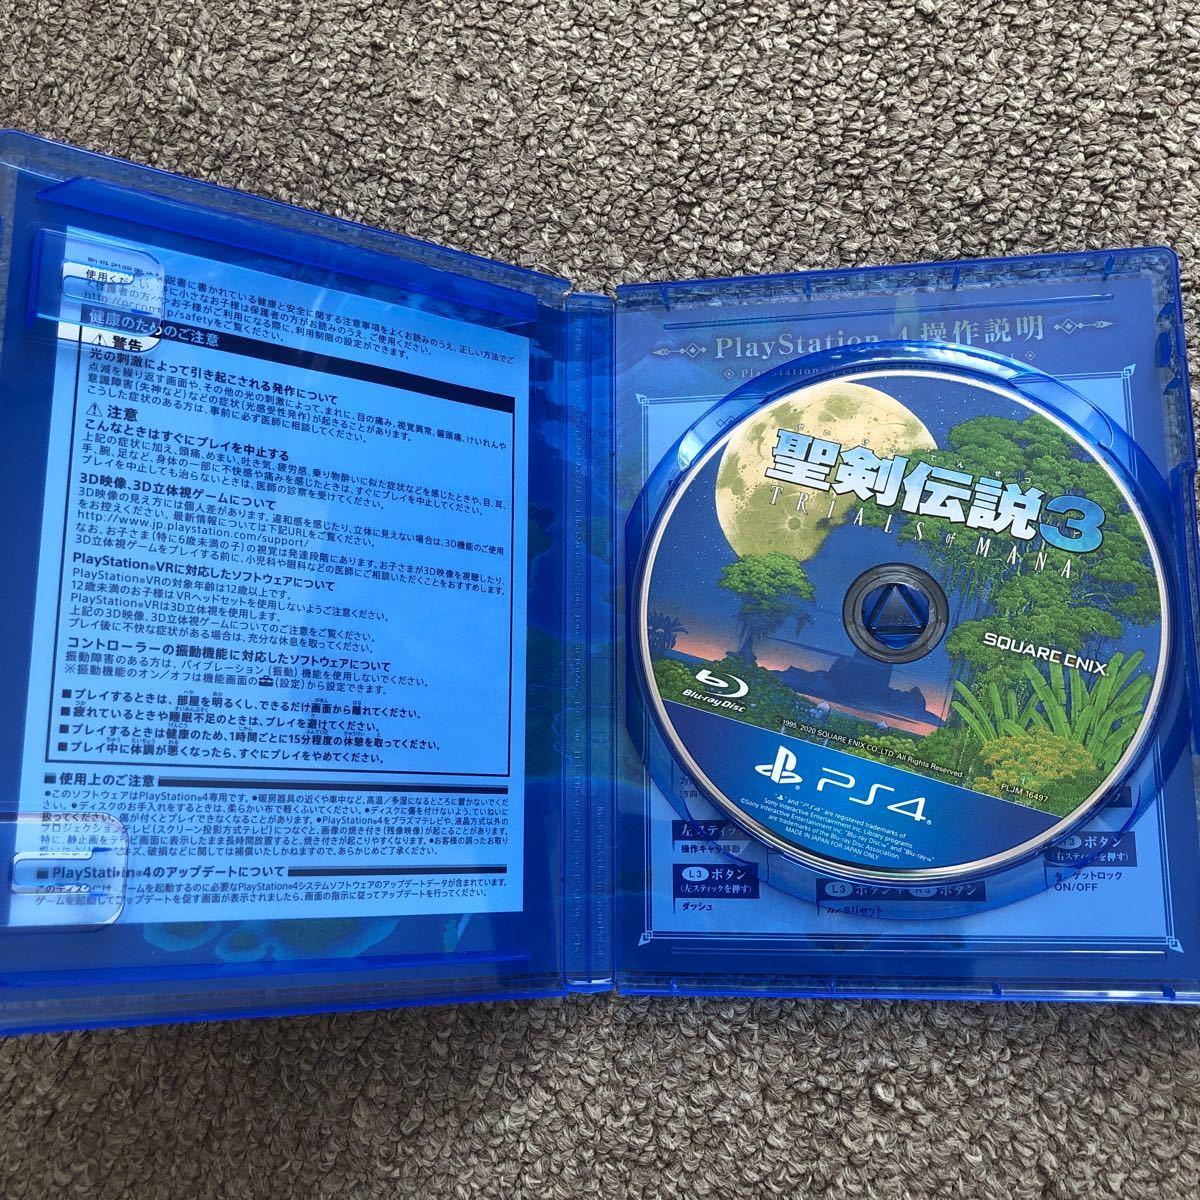 【PS4】 聖剣伝説3 トライアルズオブマナ 初回特典付き